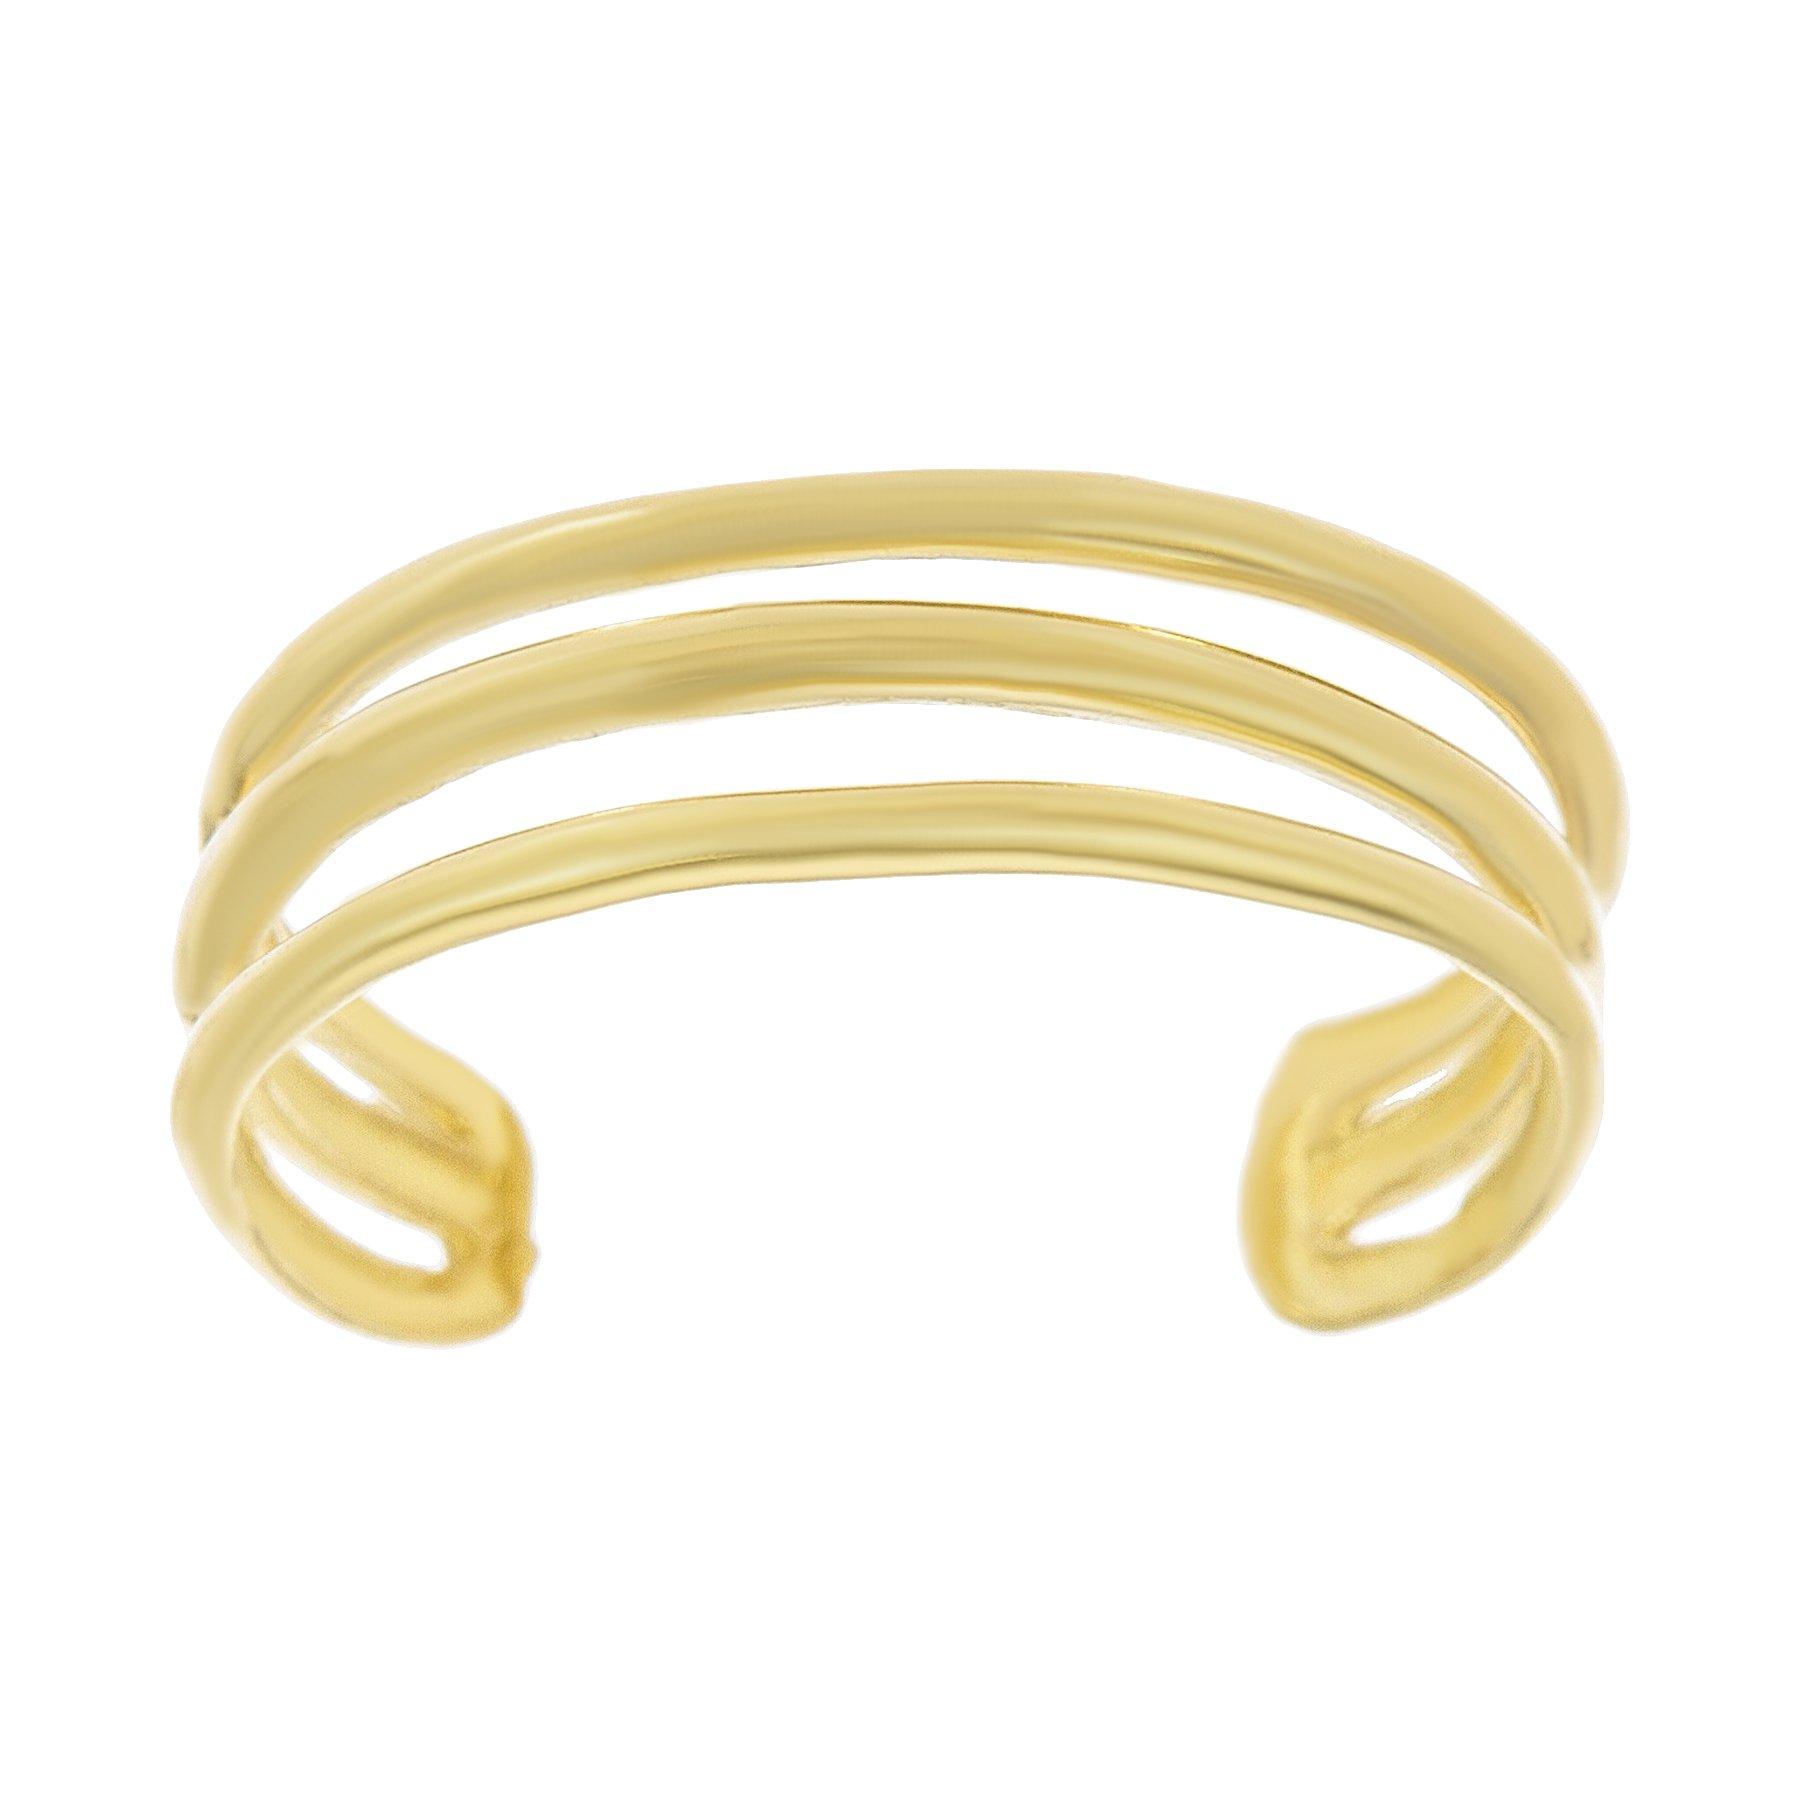 Lavari - 10K Yellow Gold Triple Band Toe Ring Adjustable by Lavari Jewelers